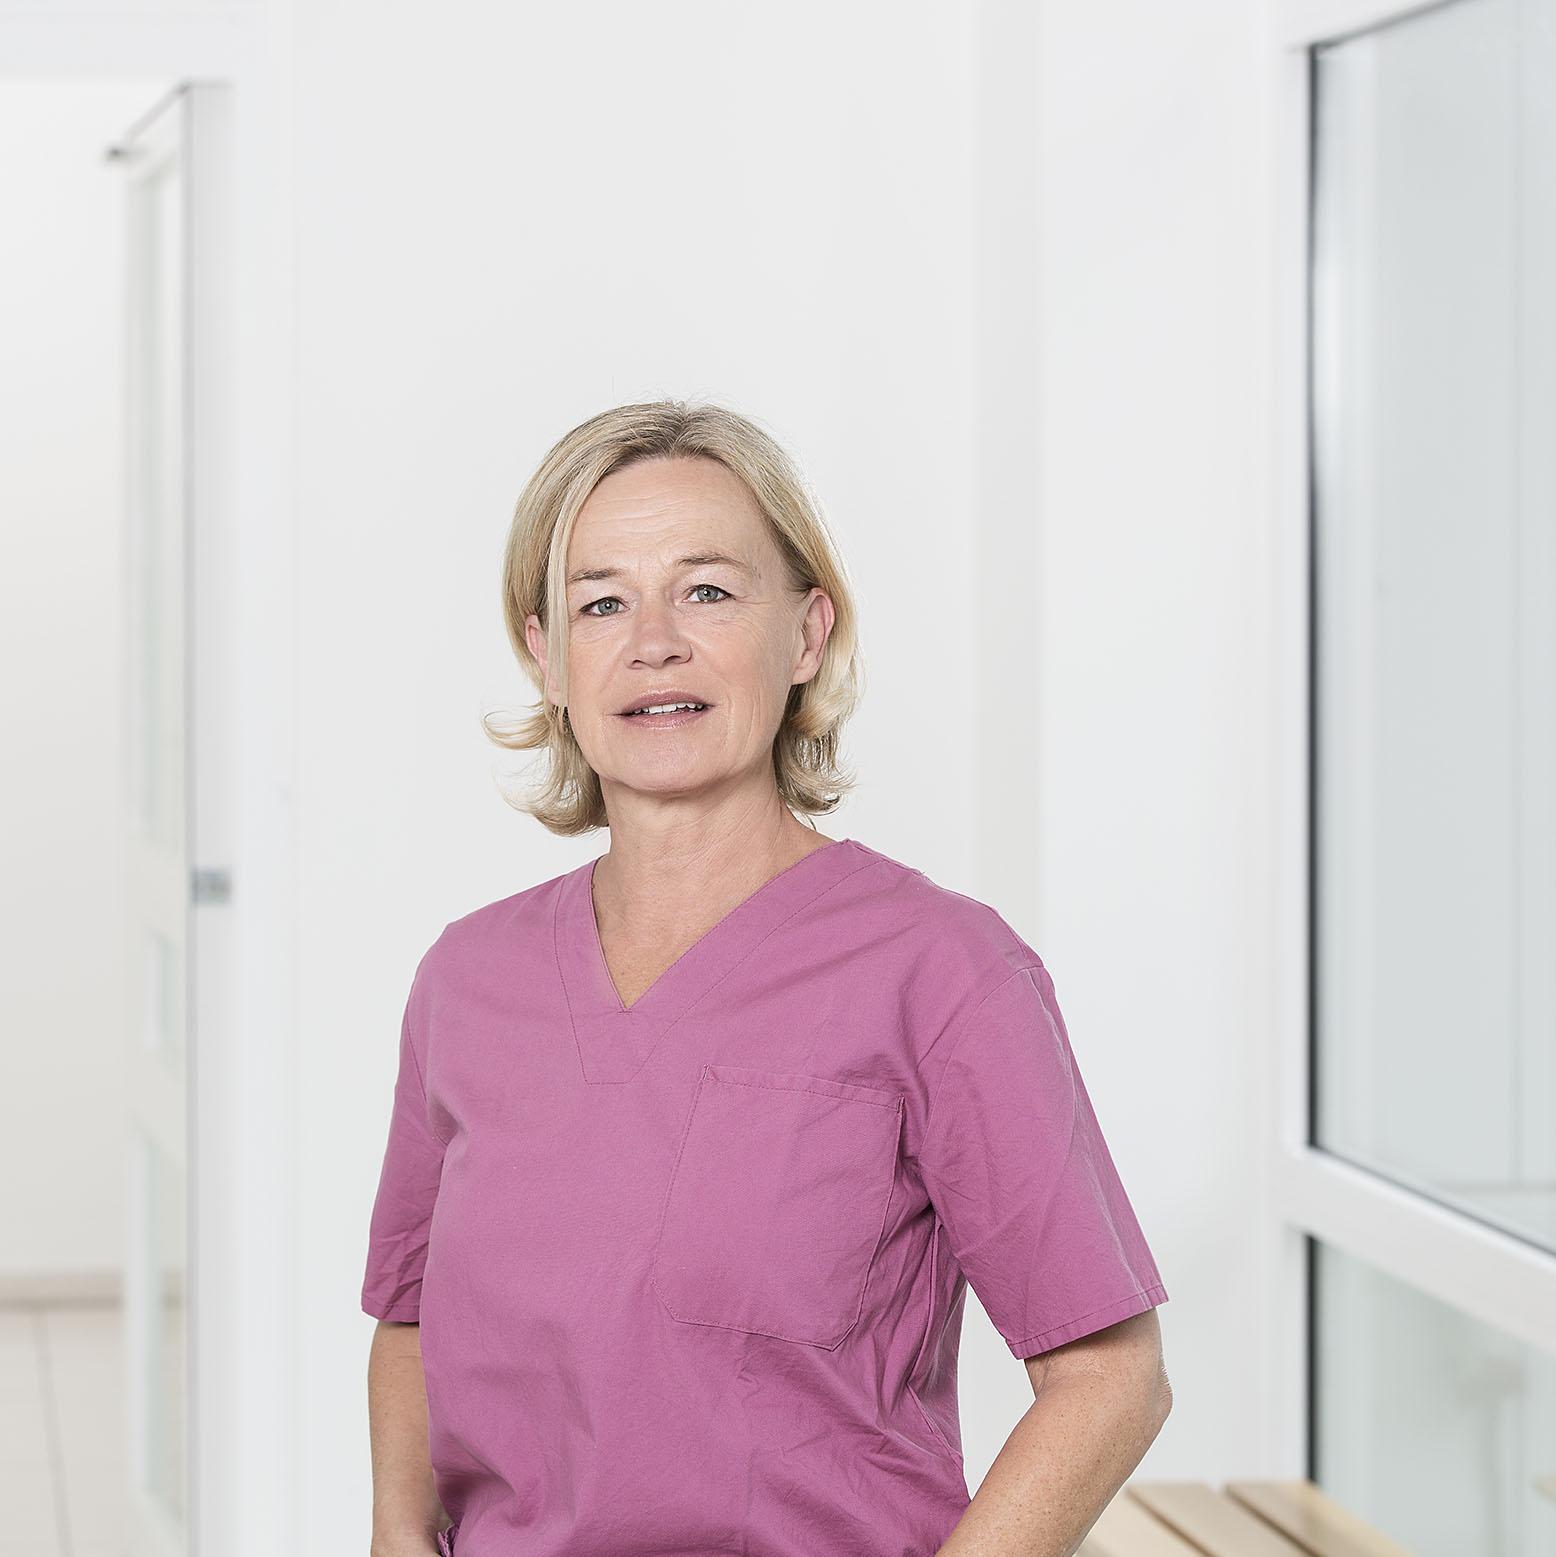 Andrea Grözinger